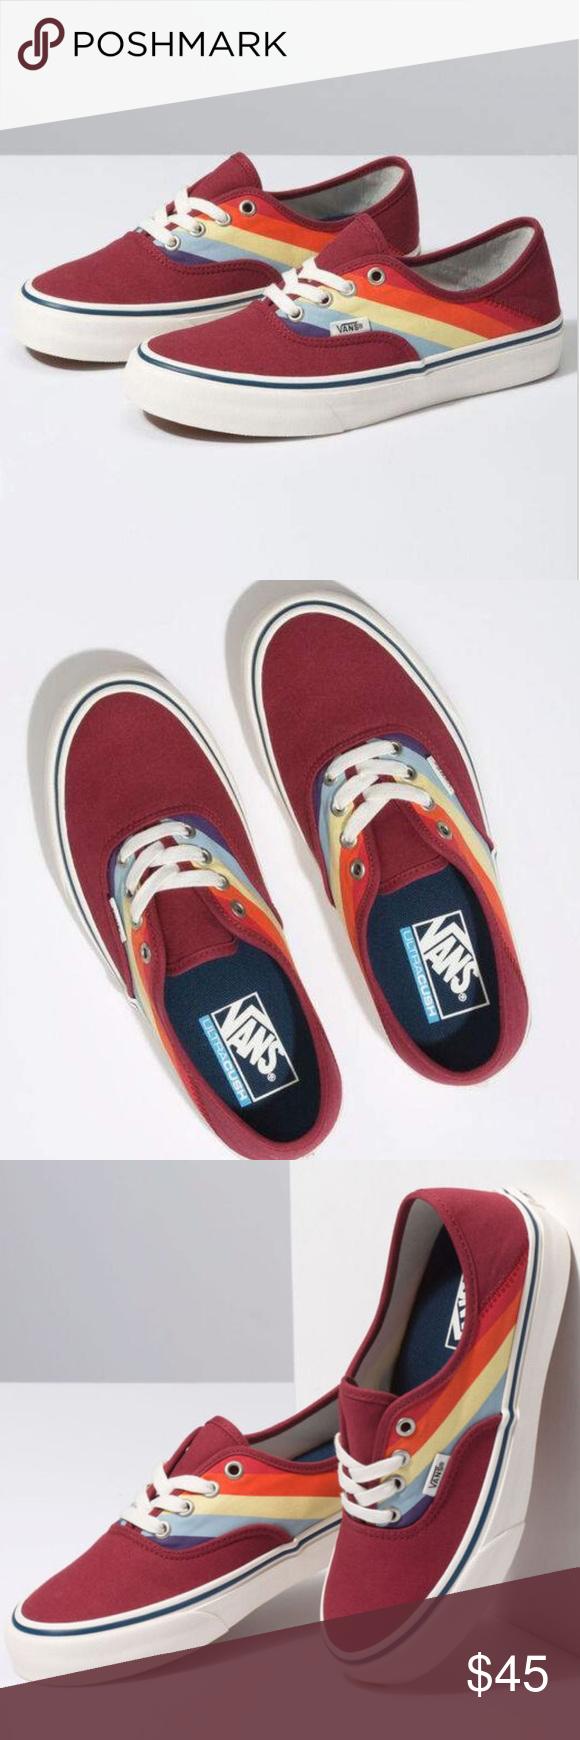 VANS Rad Rainbow Authentic SF Shoes